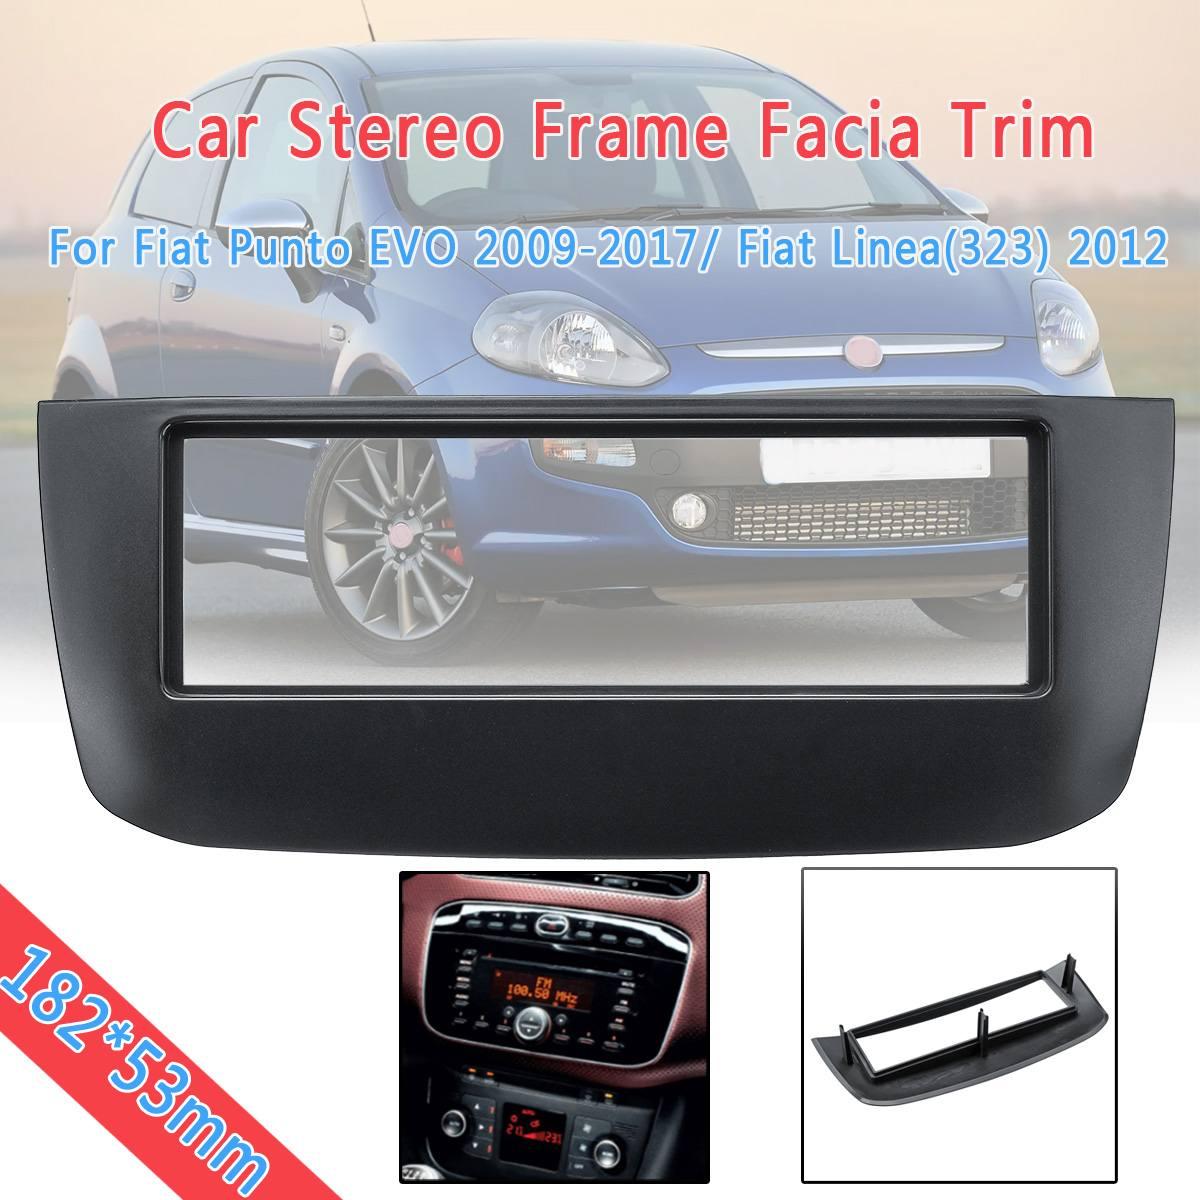 FIAT PUNTO CD RADIO STEREO FACIA FASCIA PANEL CT24FT04